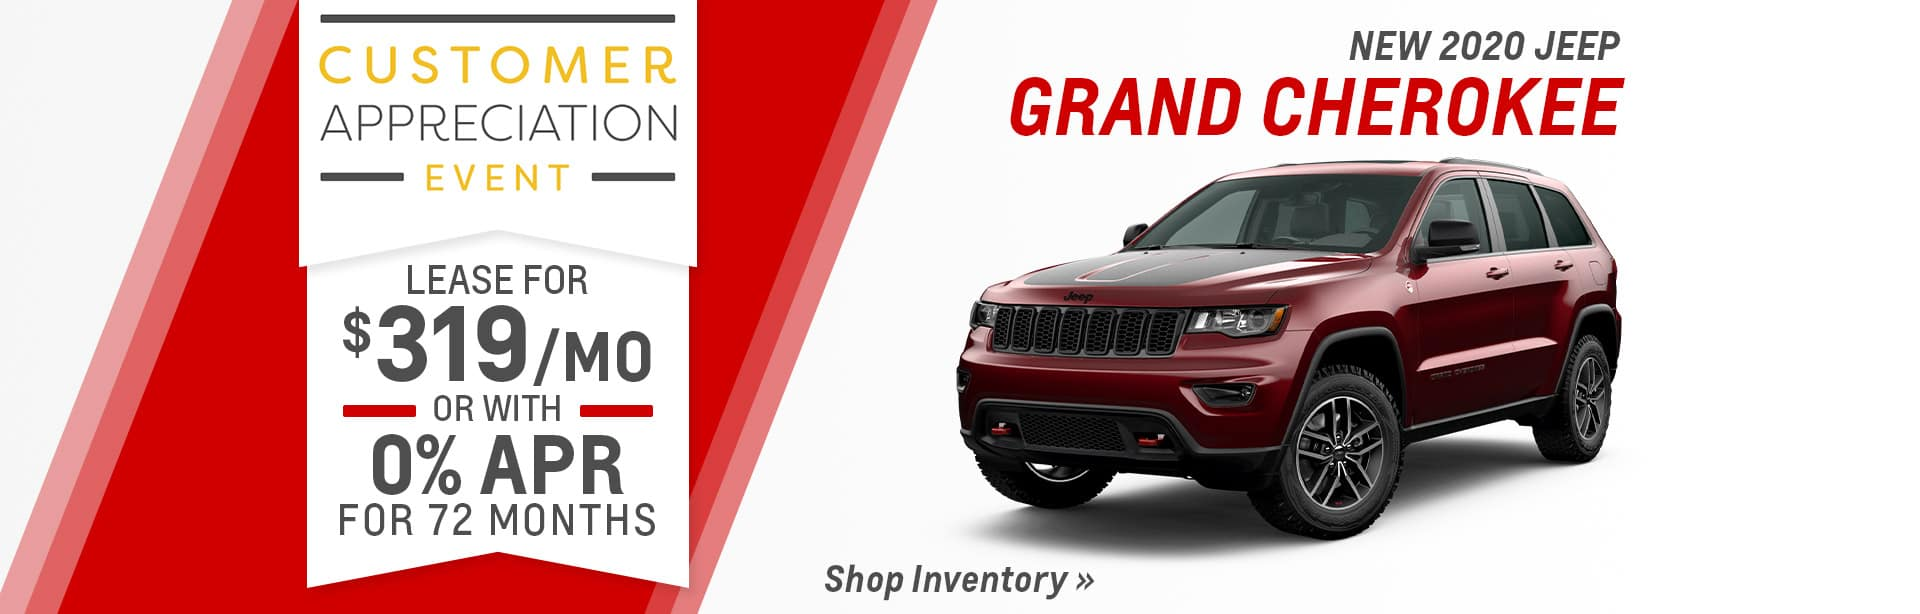 New Jeep Grand Cherokee Dealer near Leo-Cedarville.